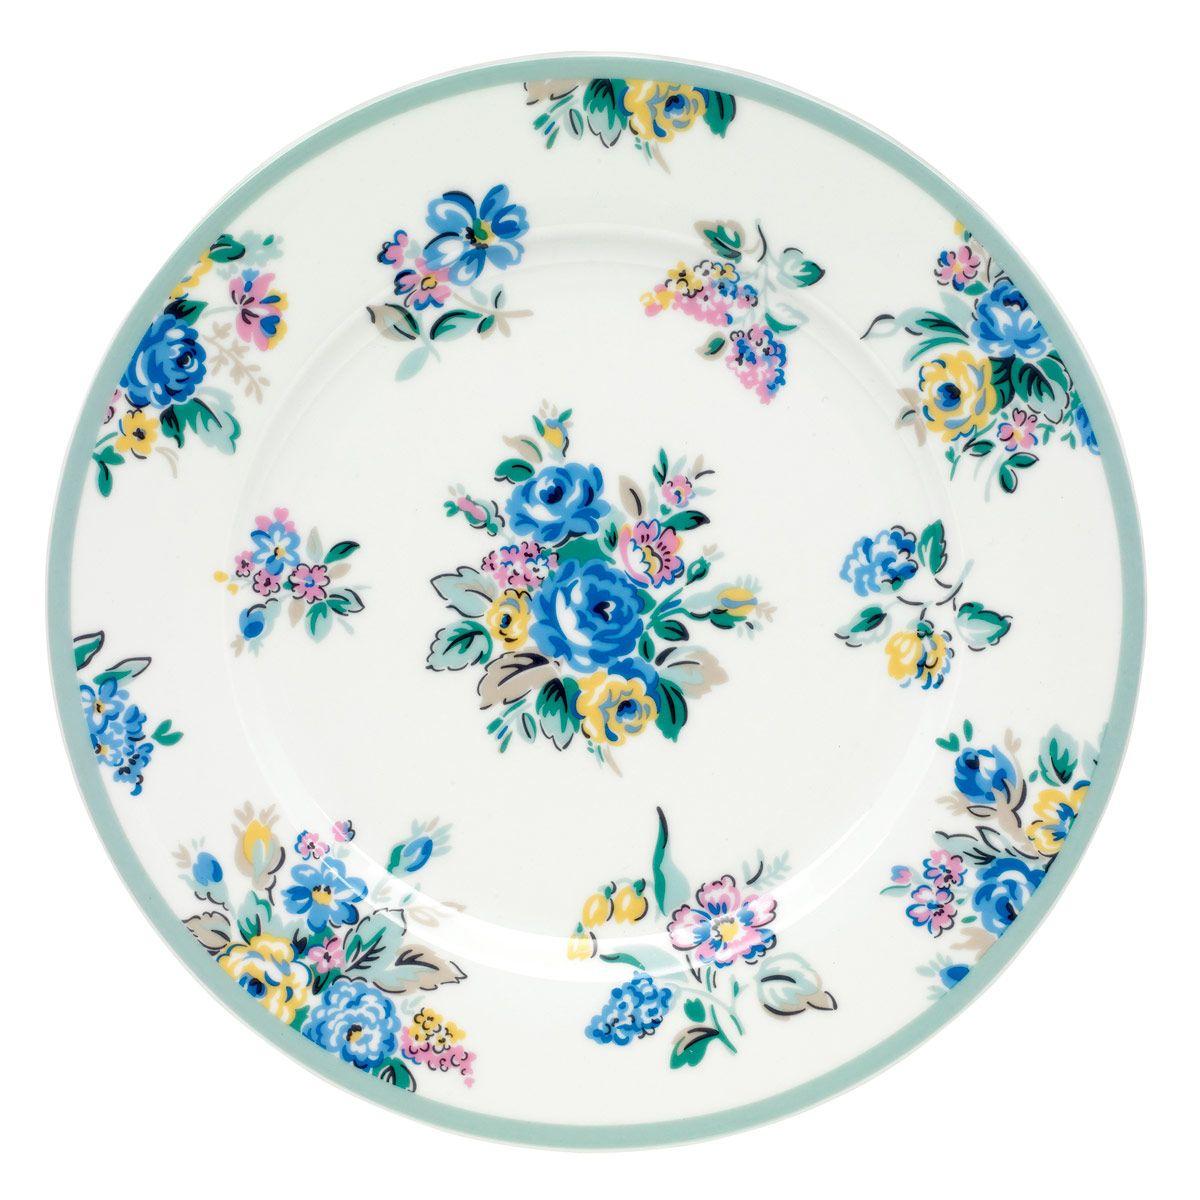 Highgate Rose Dessert Plate | Cooking and Dining | CathKidston  sc 1 st  Pinterest & Highgate Rose Dessert Plate | Cooking and Dining | CathKidston ...